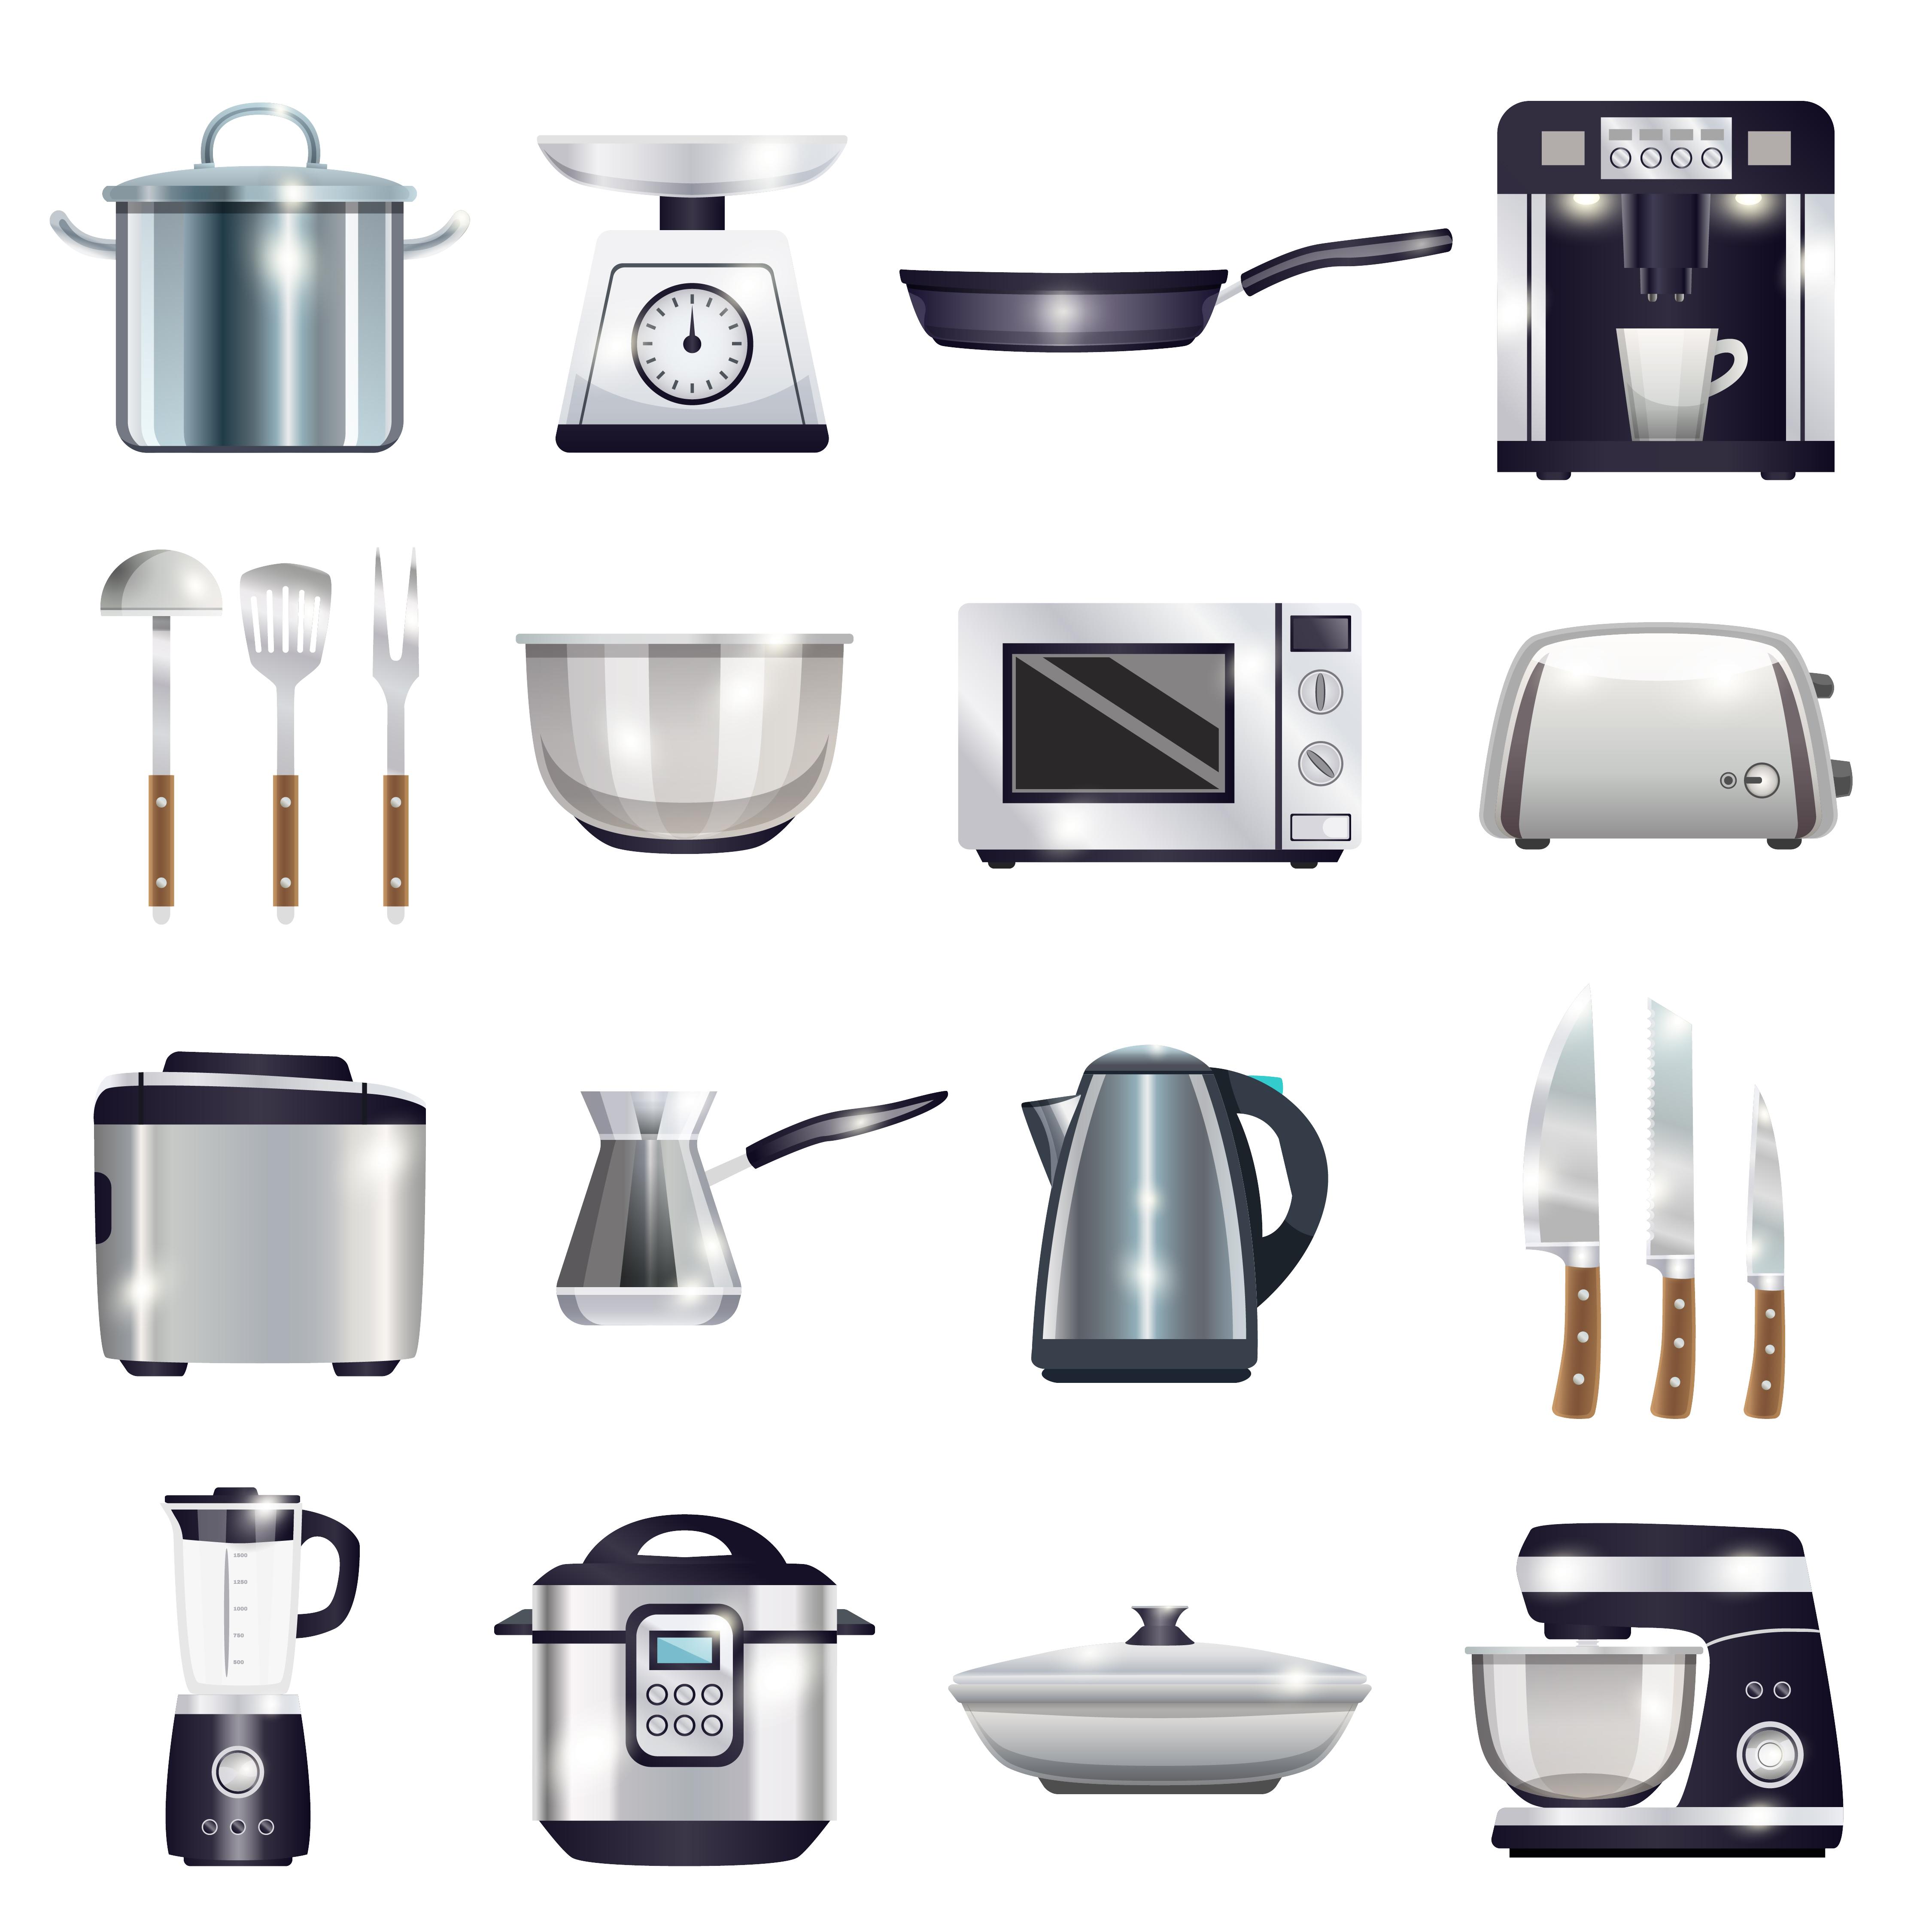 Kitchen Accessories Set - Download Free Vectors, Clipart ...